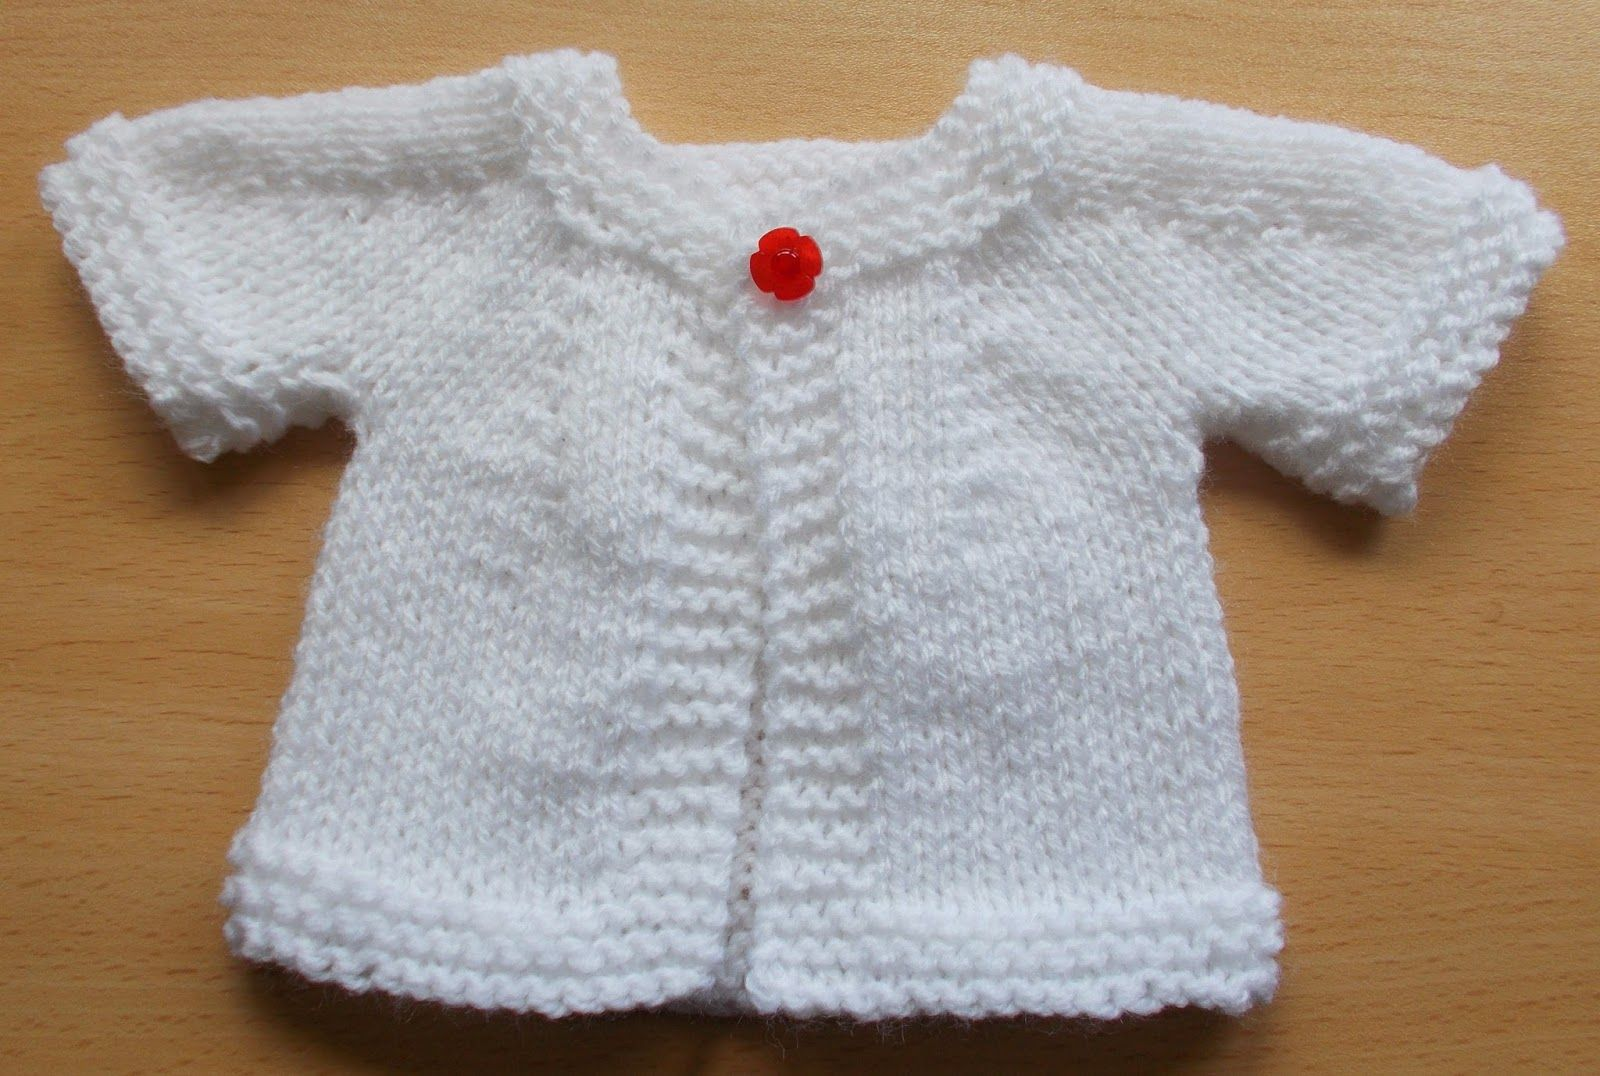 marianna\'s lazy daisy days: Cute Cardigan for a Teddy or Baby Doll ...